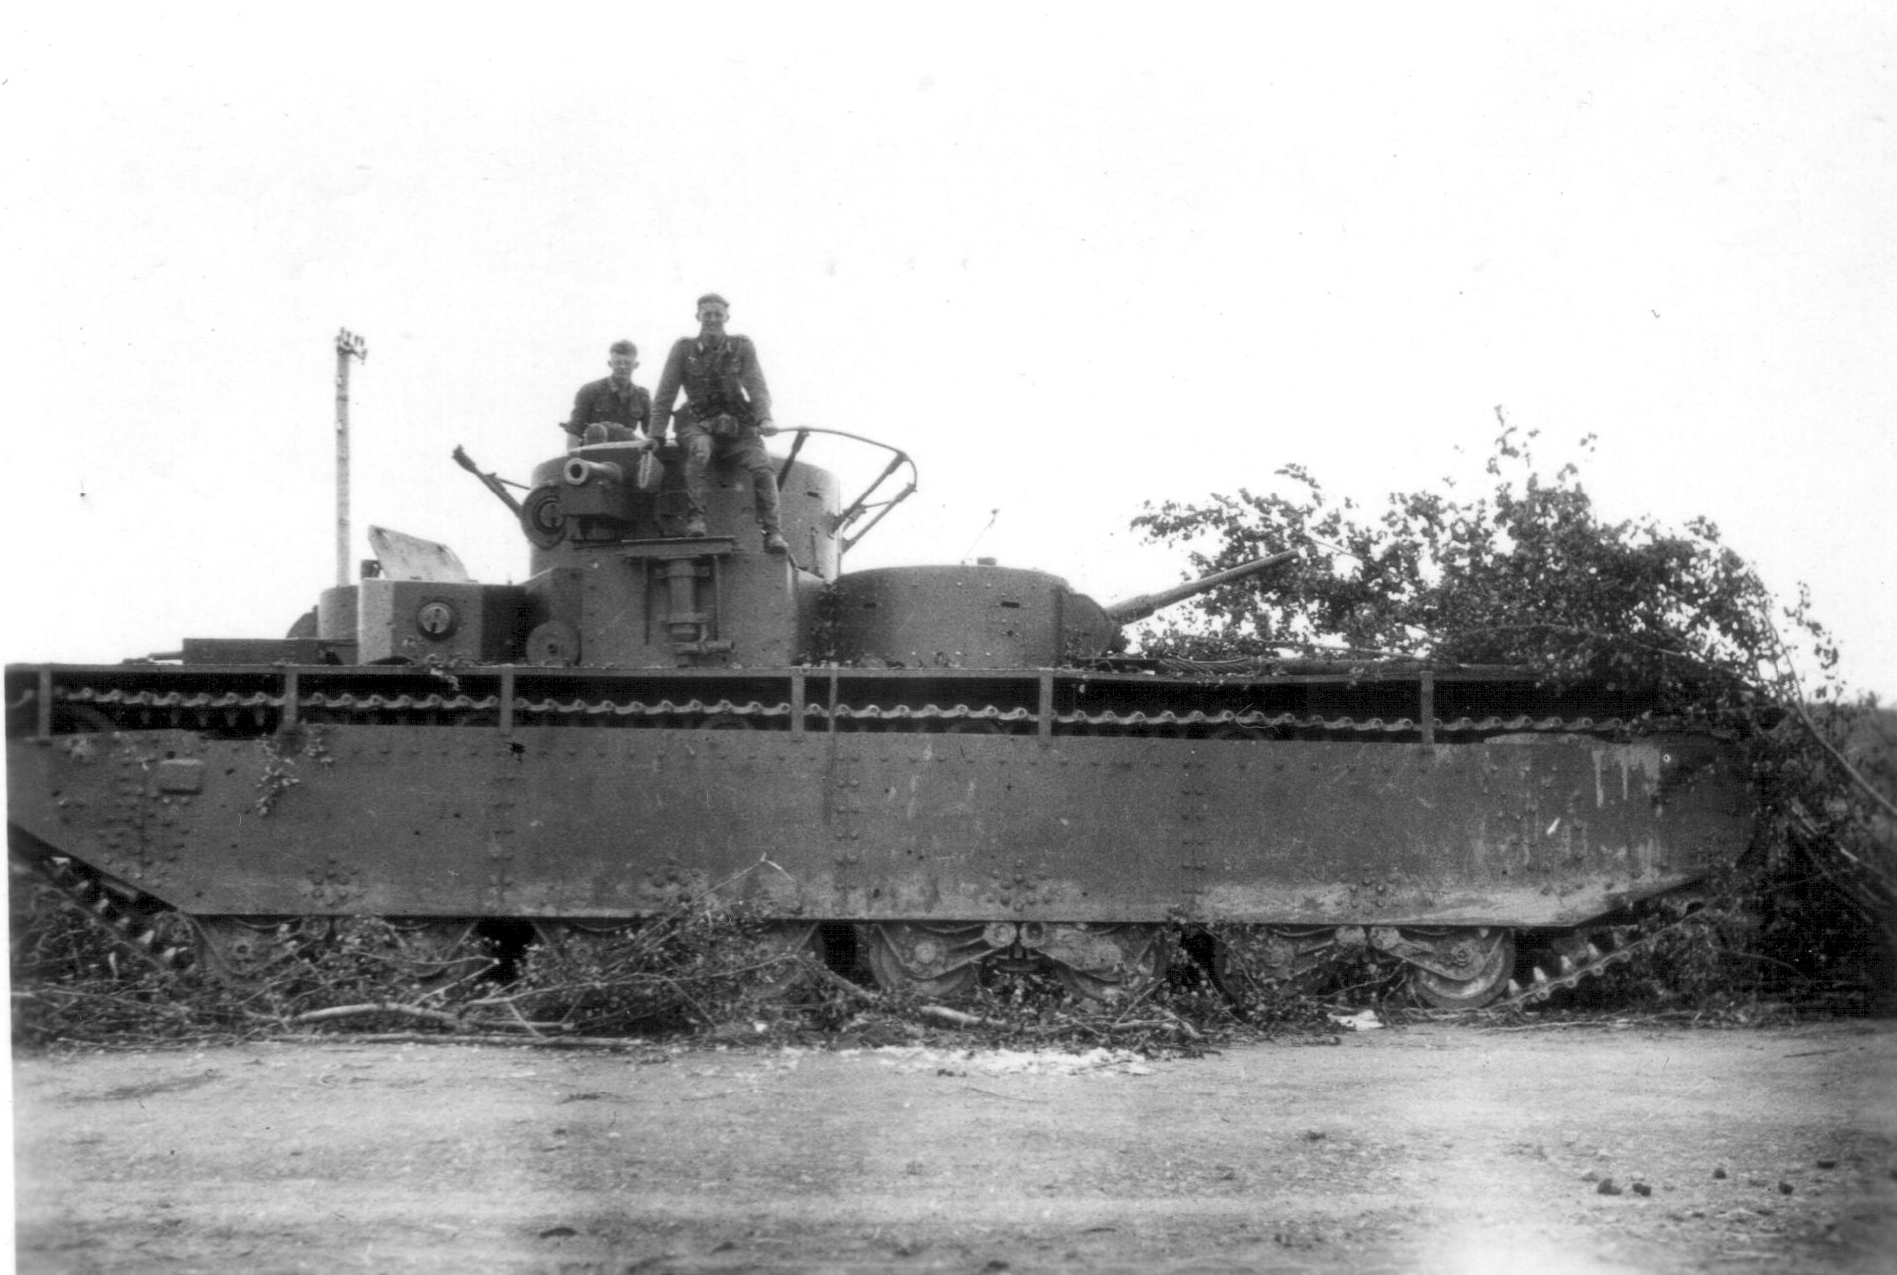 http://upload.wikimedia.org/wikipedia/commons/0/00/T-35_model_1935.jpg